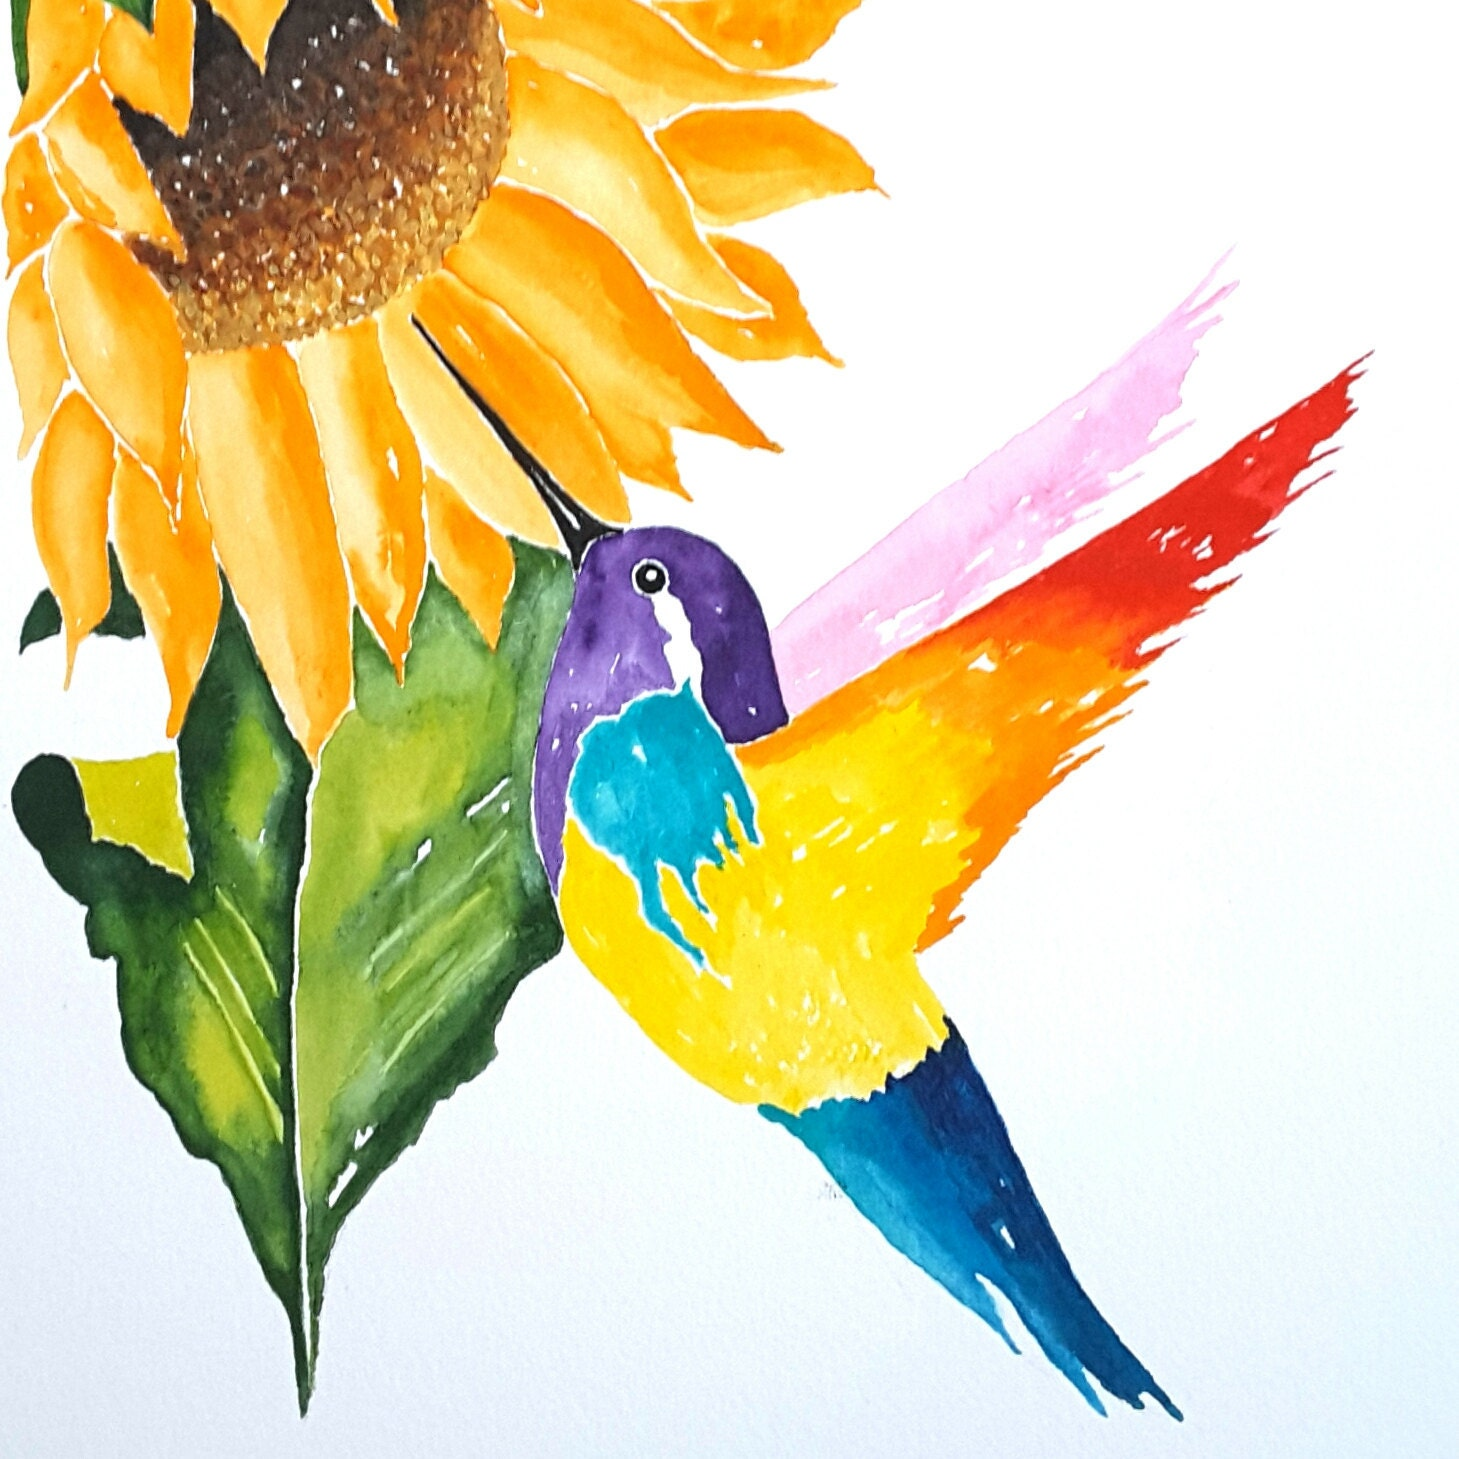 Original Watercolor Painting Bird Art Colorful Bird and